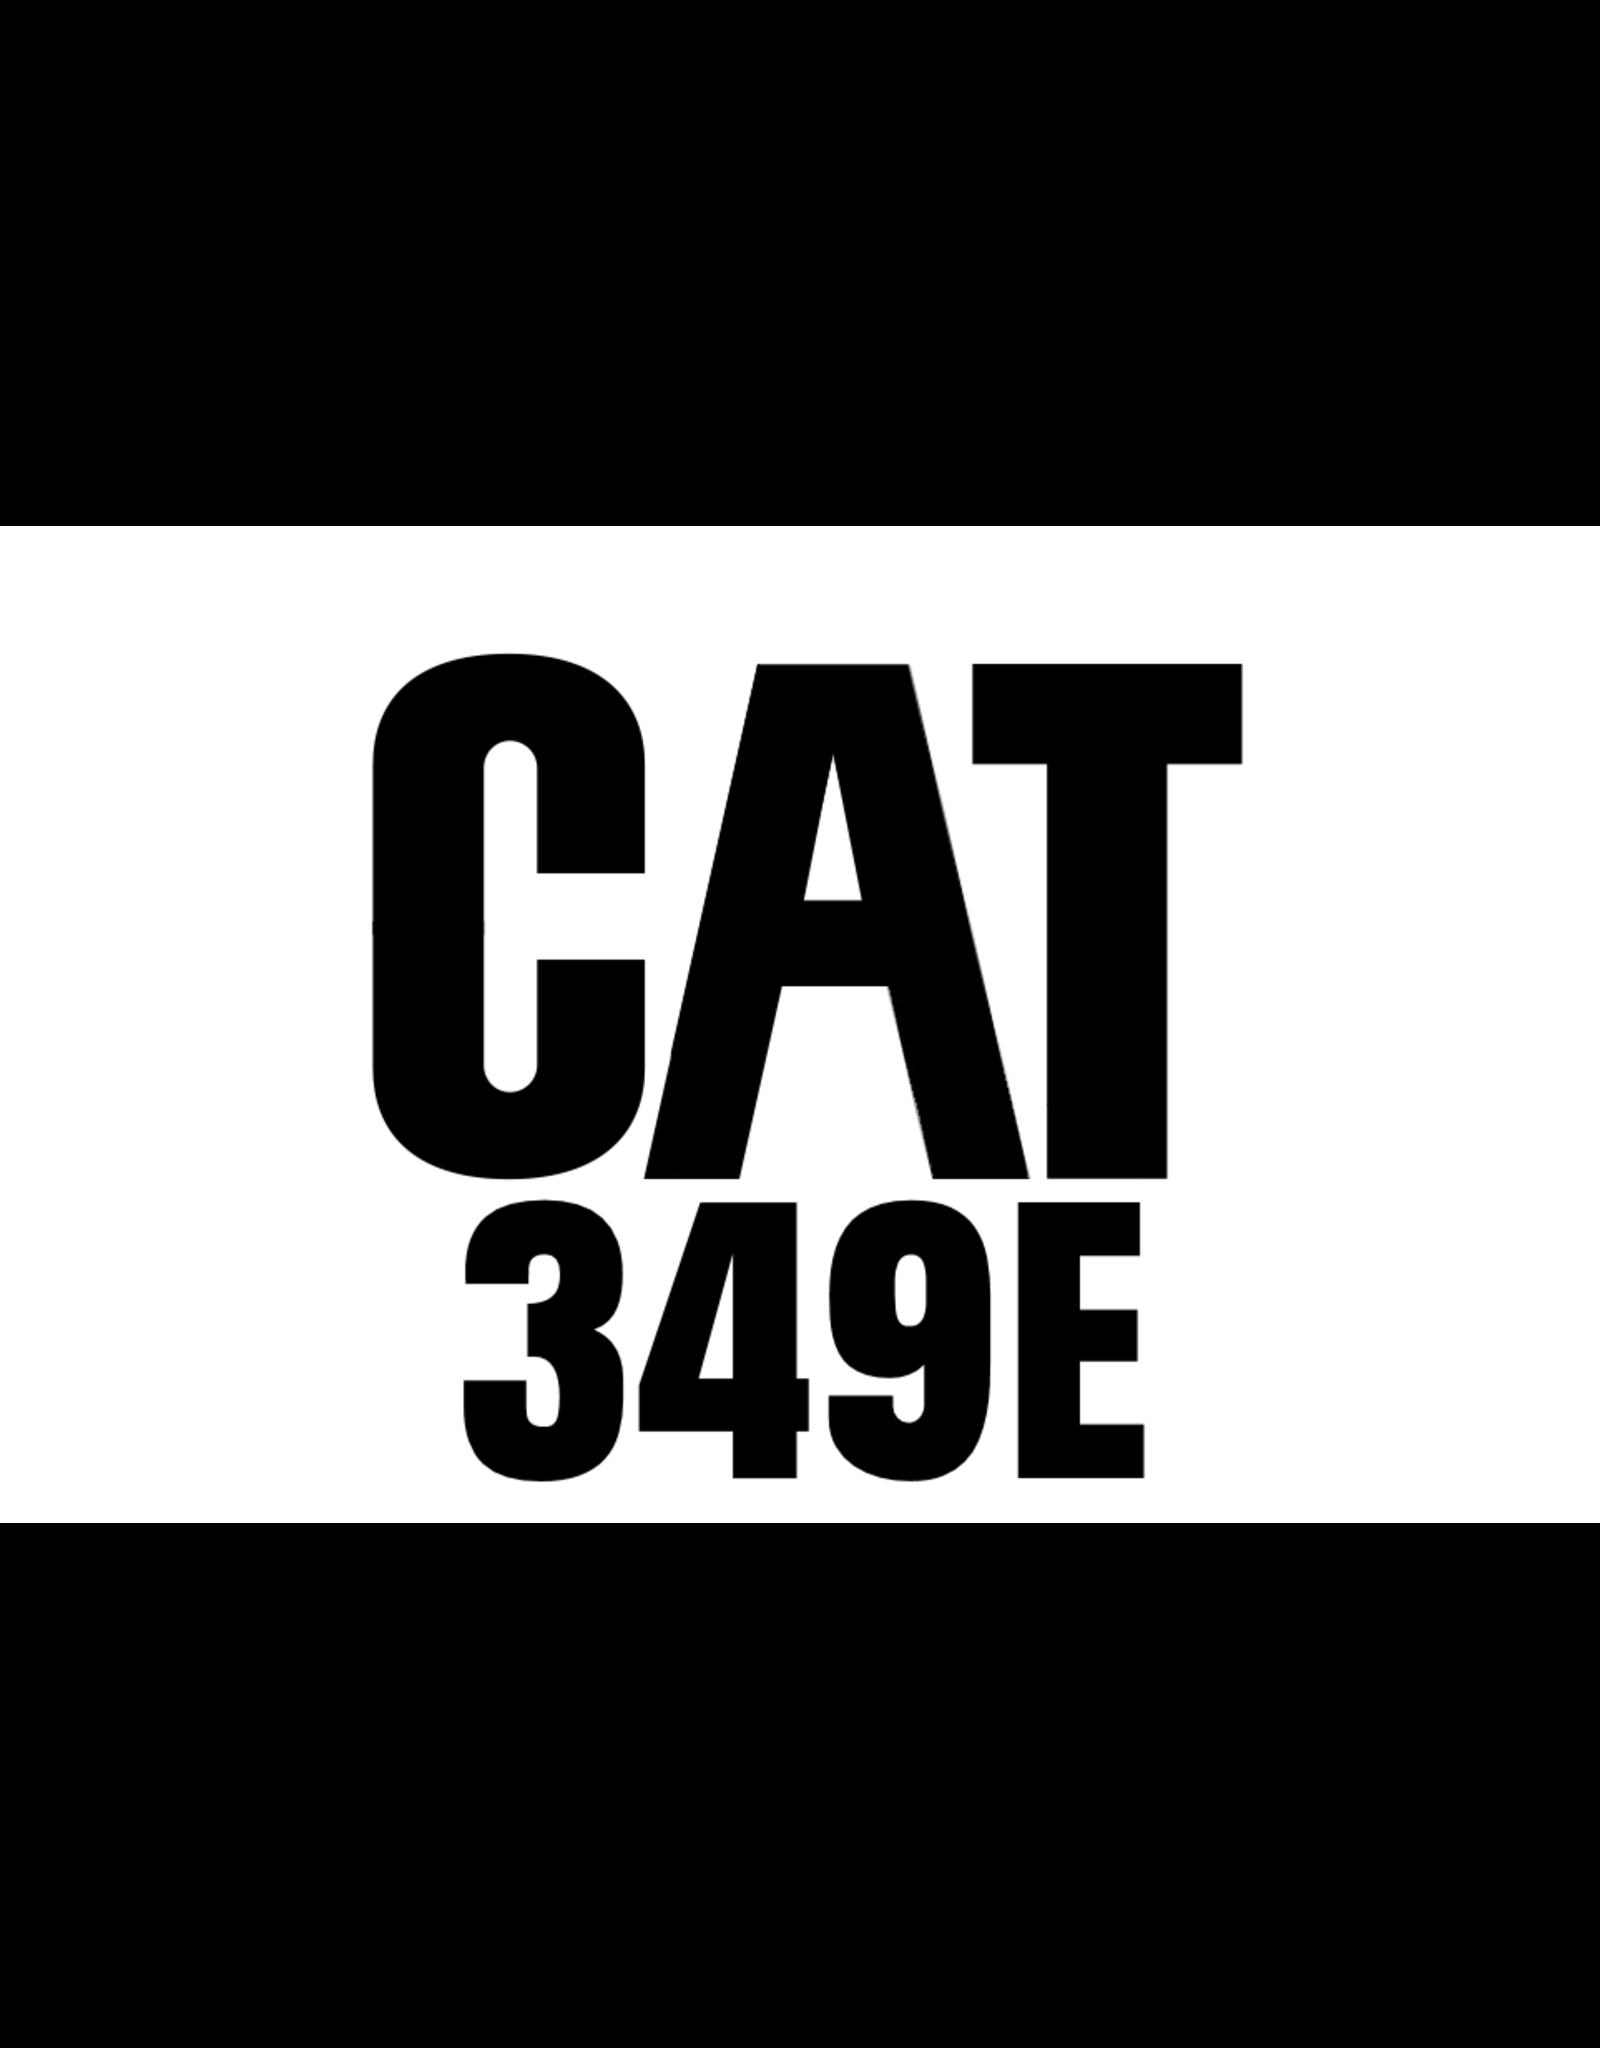 Echle Hartstahl GmbH FOPS für CAT 349E